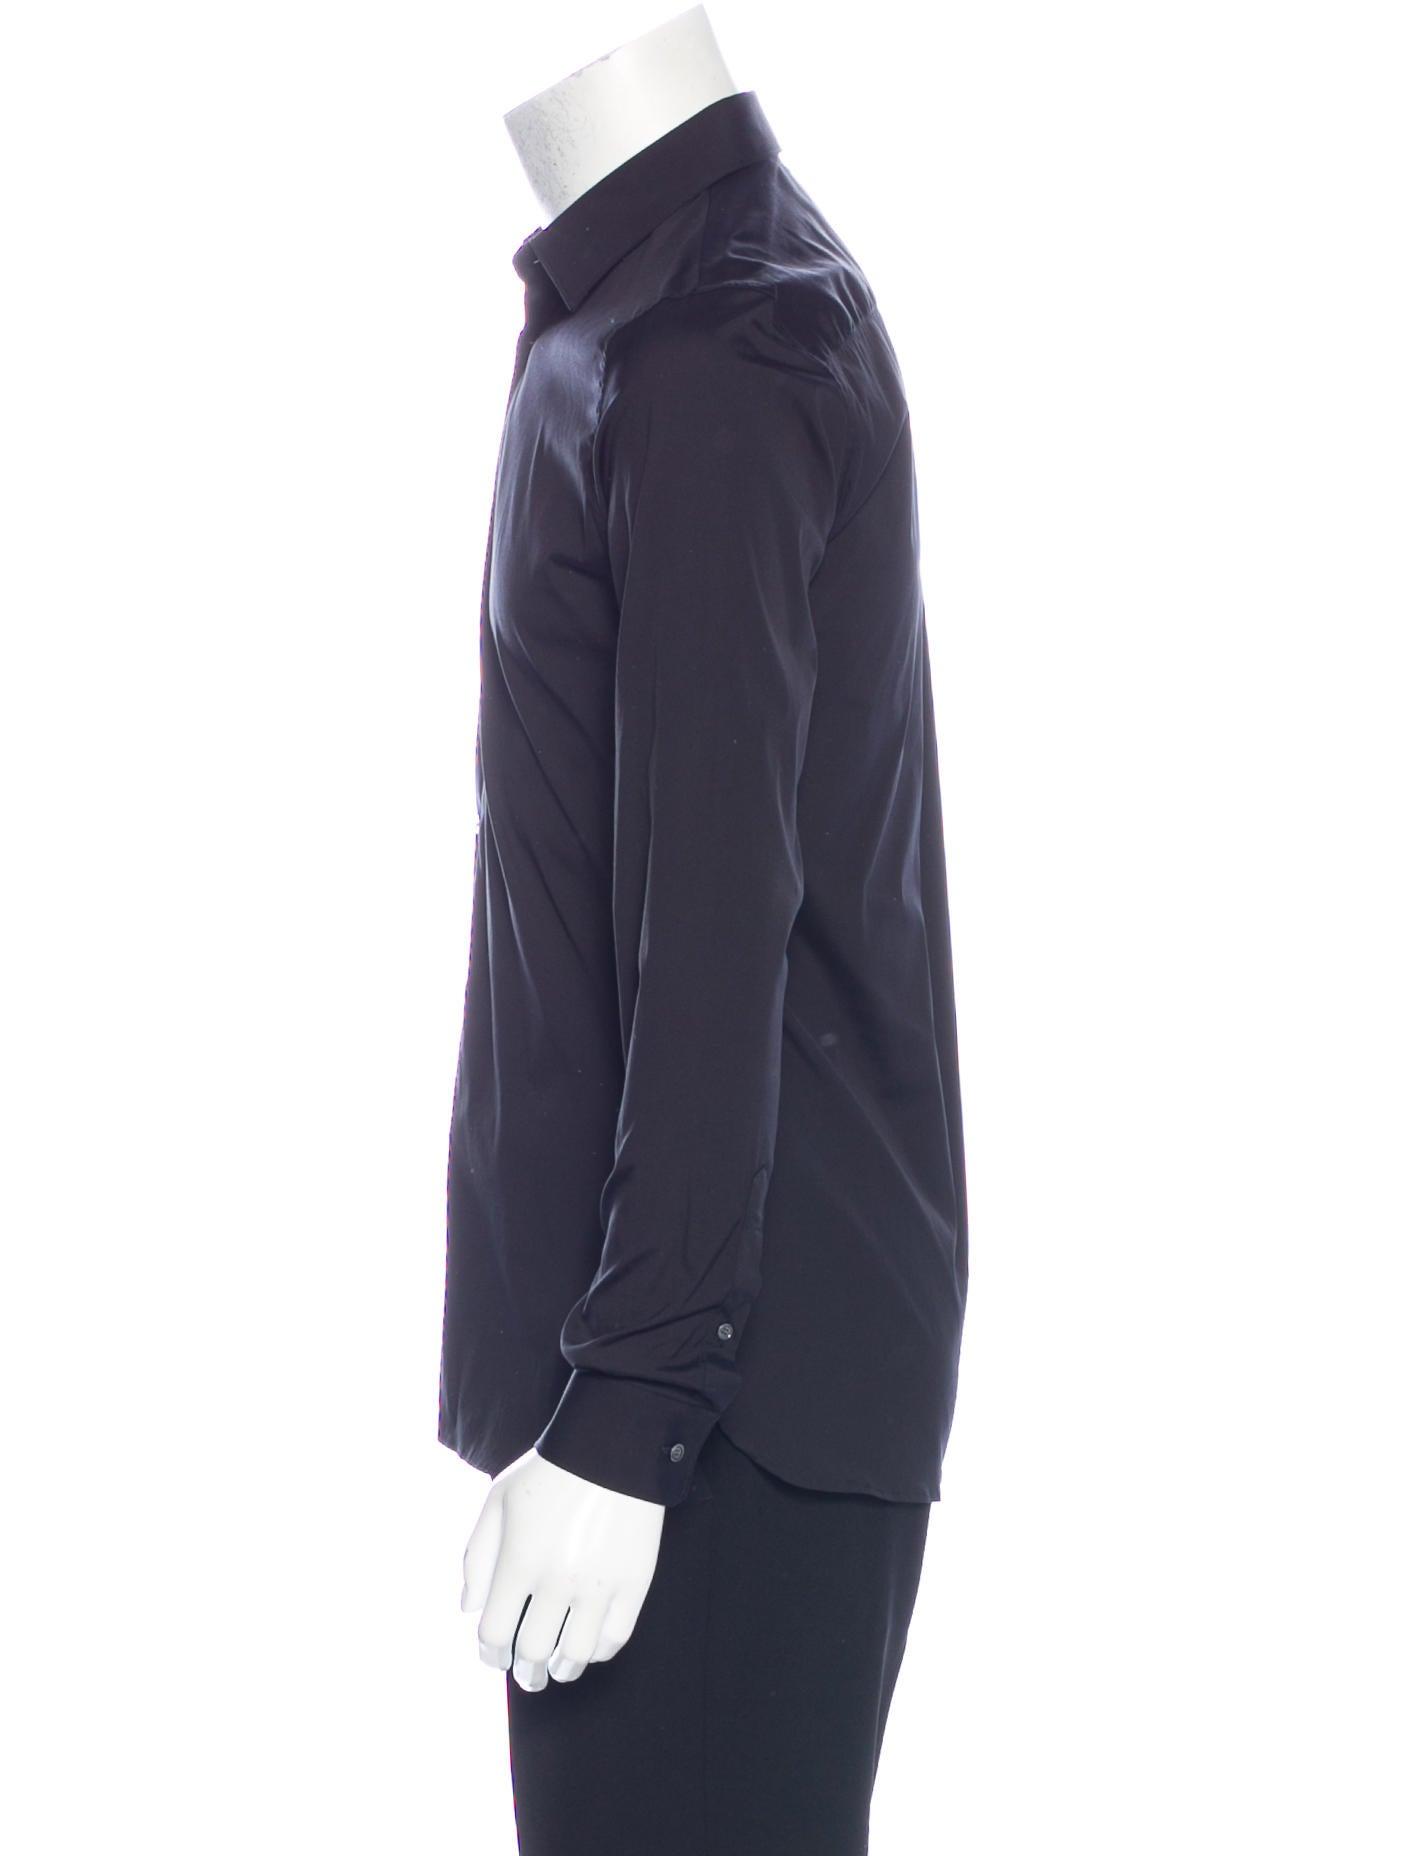 Burberry london woven dress shirt w tags clothing Woven t shirt tags